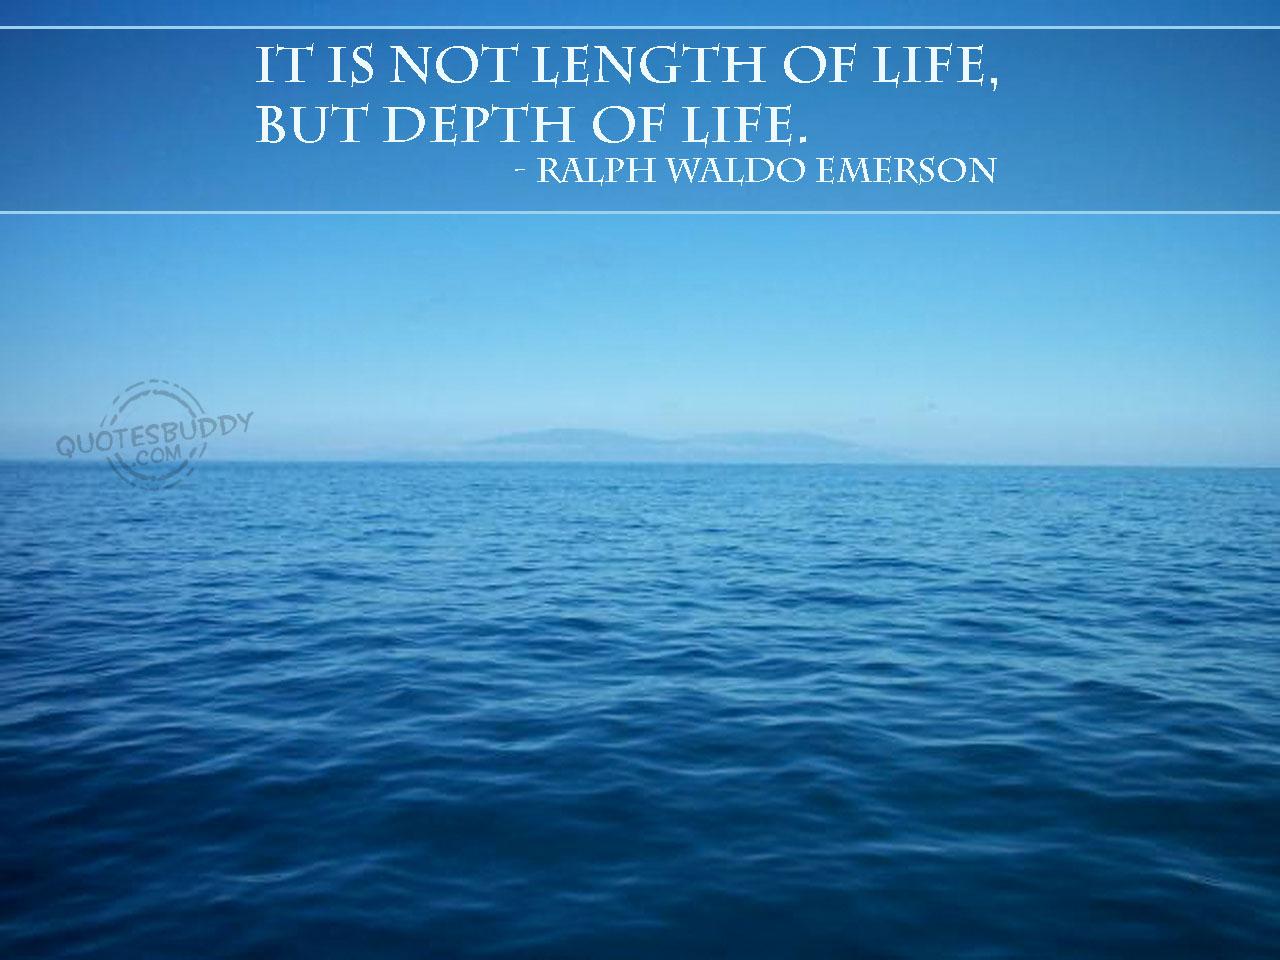 Beautiful Quotes On Life Wallpapers Desktop Ba 16719 Wallpaper 1280x960